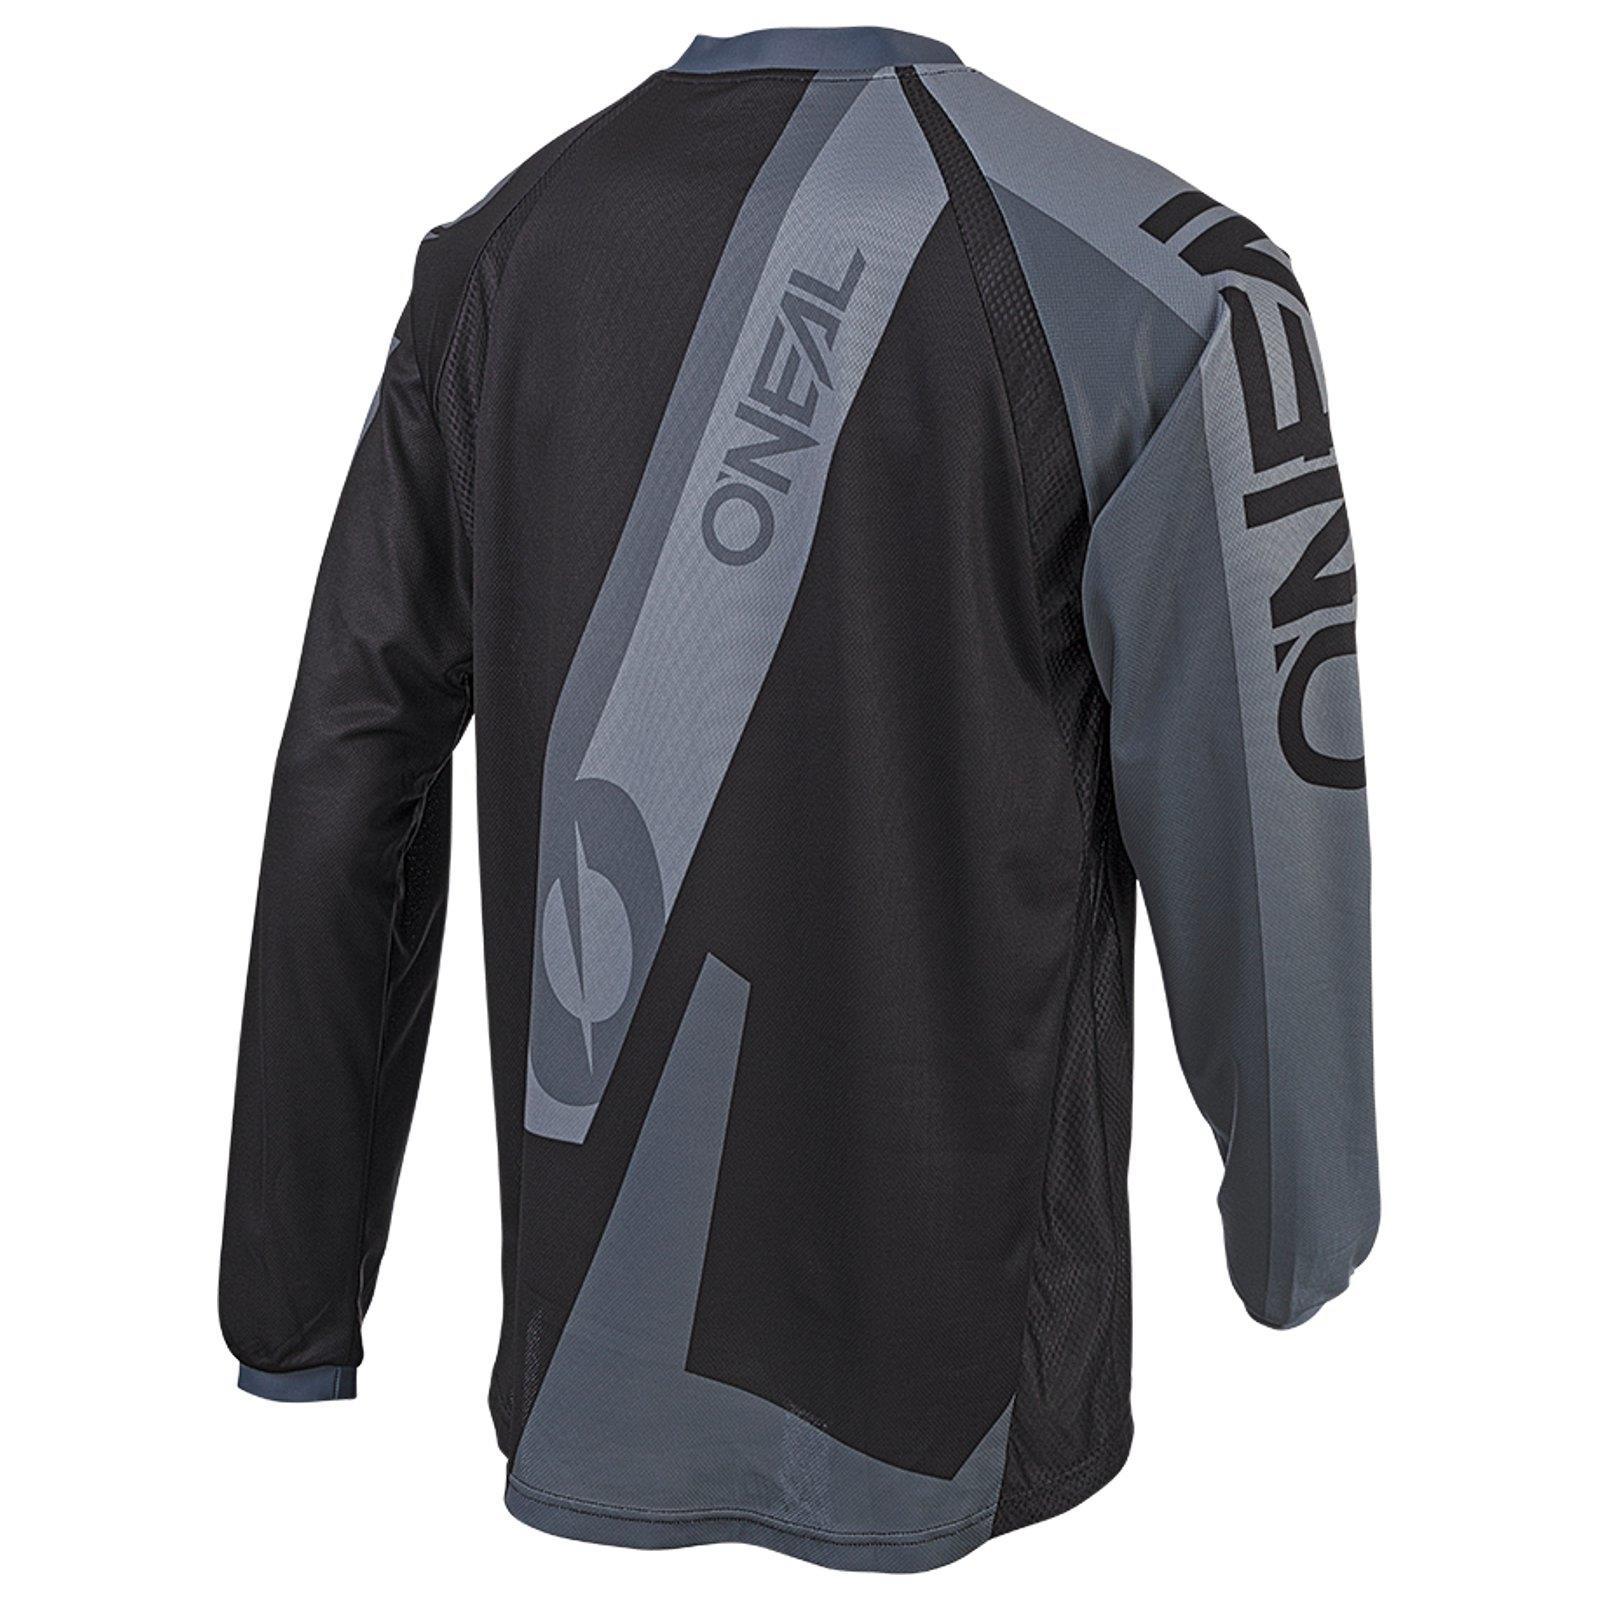 O-039-Neal-elemento-Mayhem-JERSEY-Racewear-Motocross-Maglia-MX-DH-FR-MTB-MOUNTAIN-BIKE miniatura 70